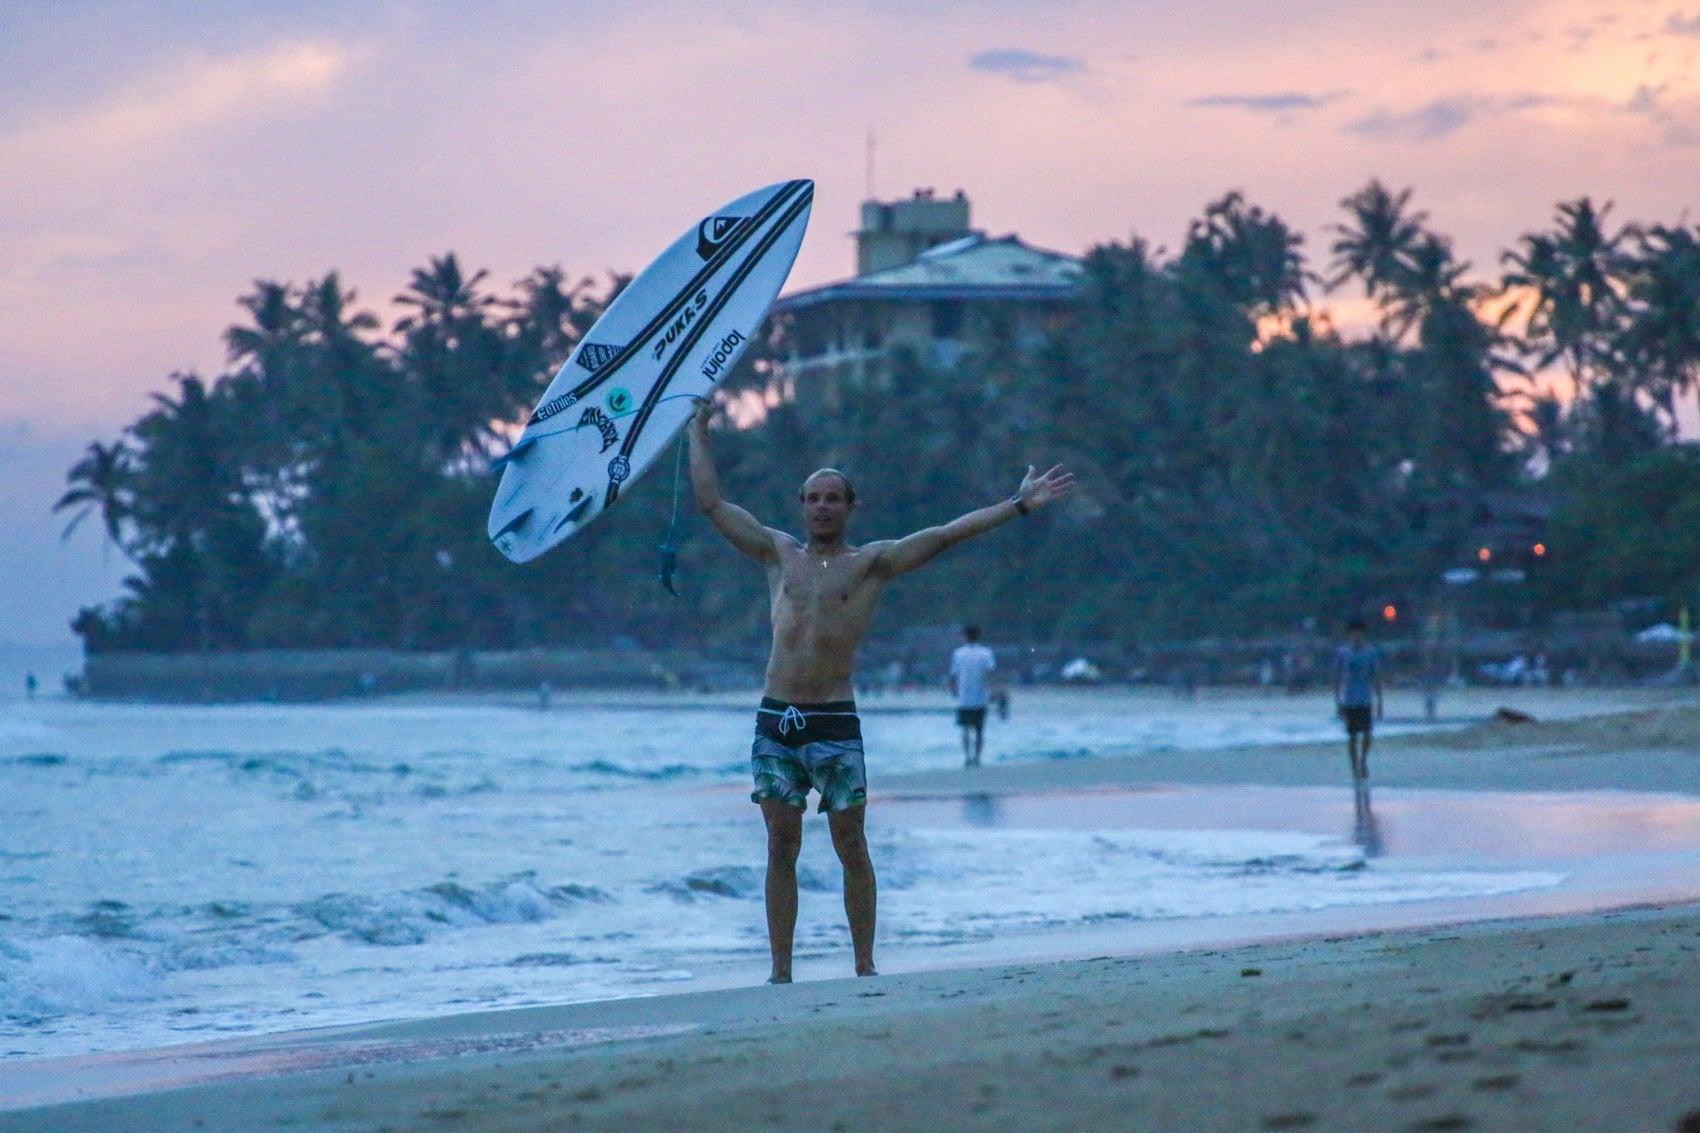 Oliver Hartkopp – The Surfing Viking